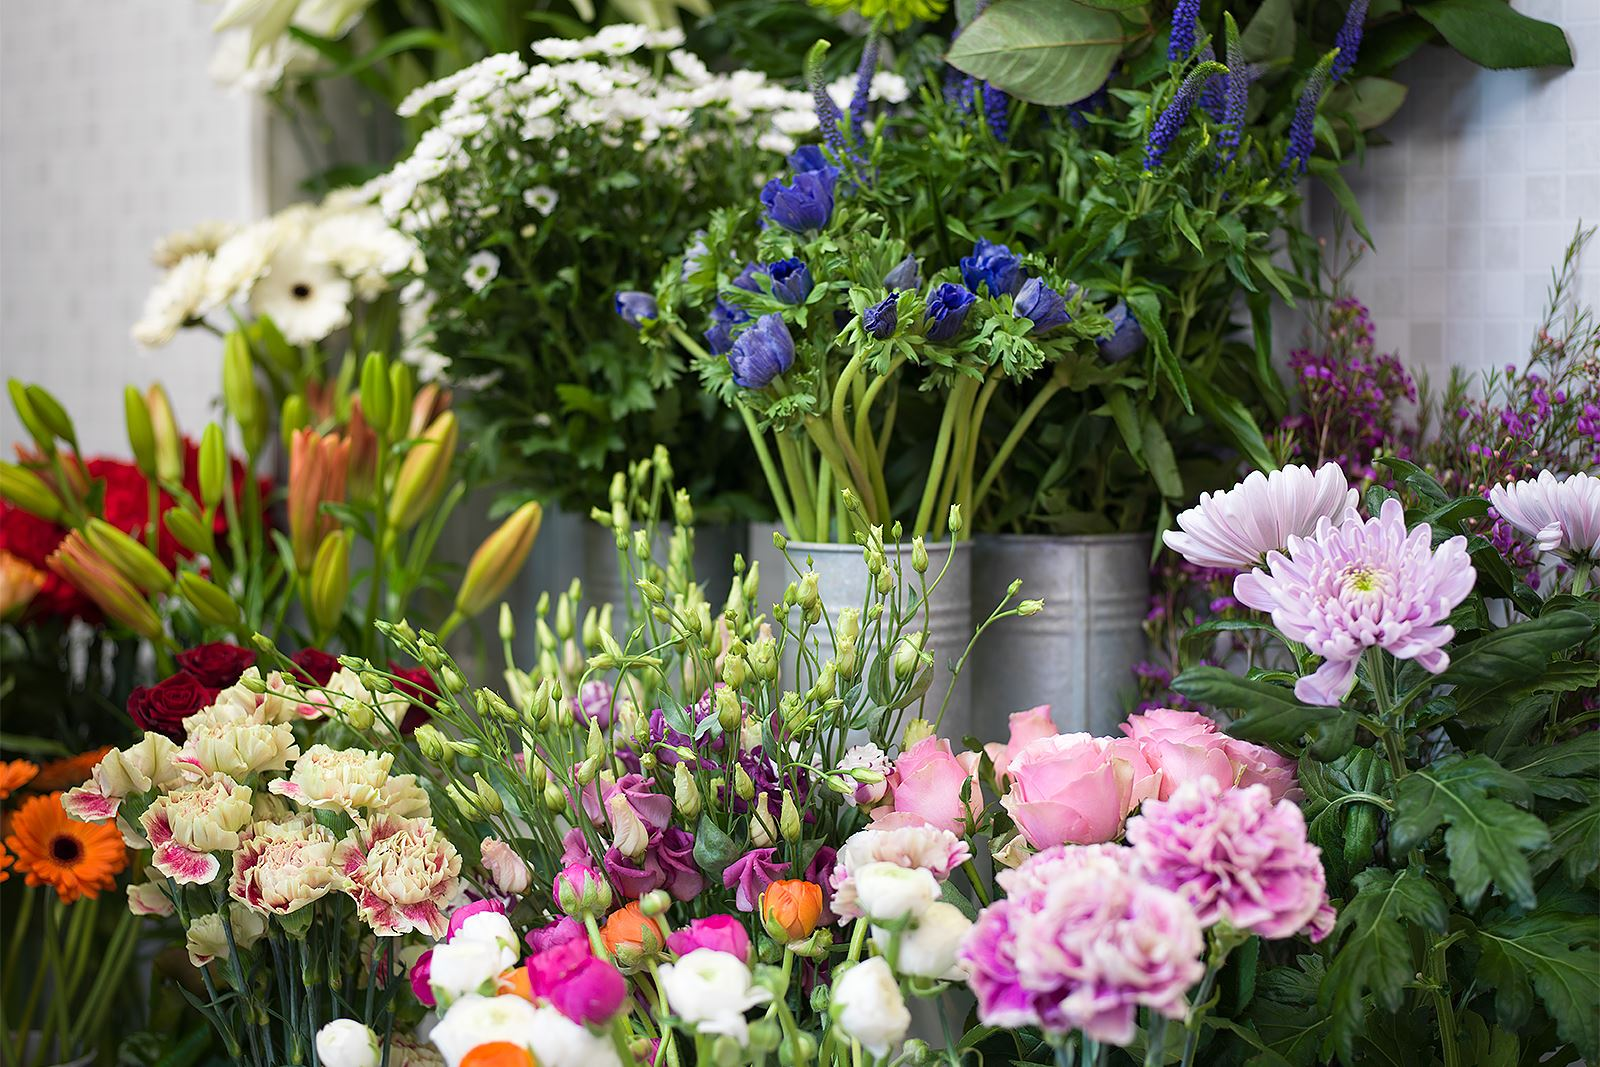 Anna Sköld, Skillingaryds Blomsterhandel - Snittblommor